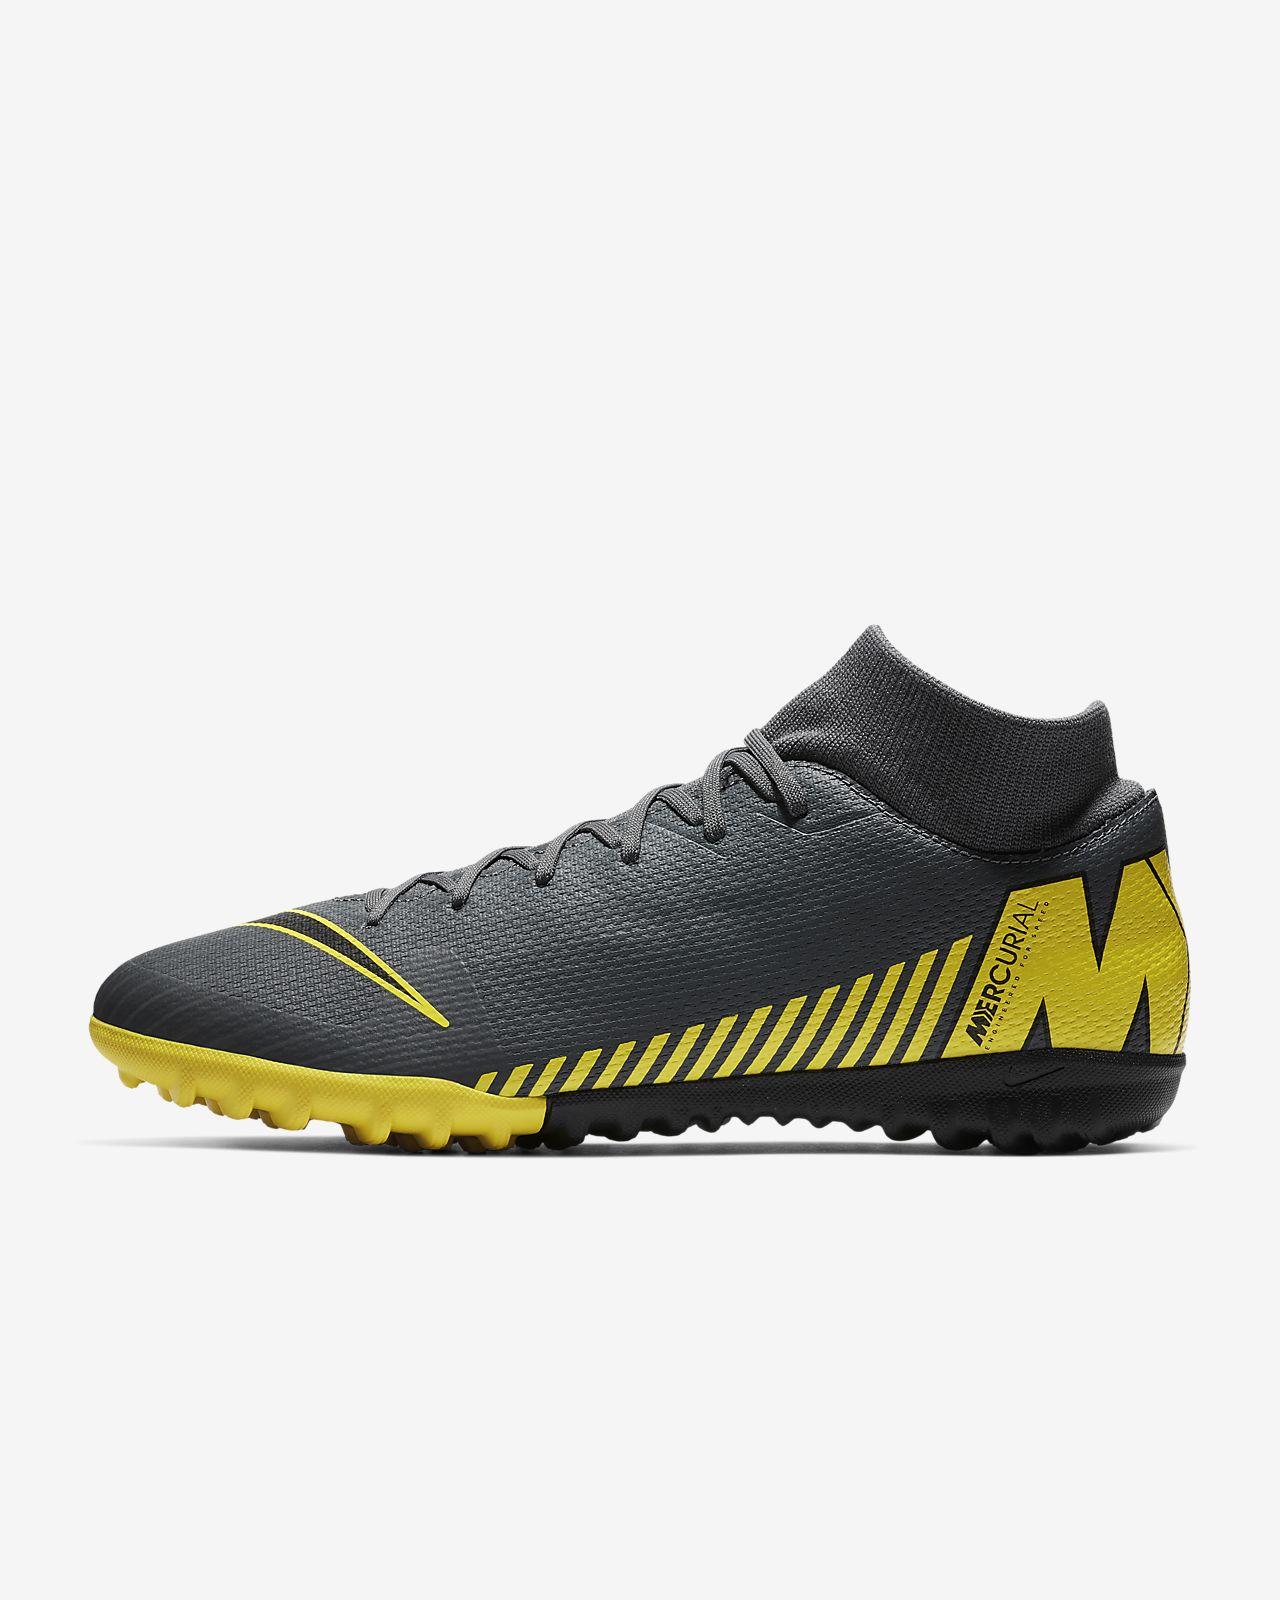 Kopačka Nike SuperflyX 6 Academy TF na umělou trávu